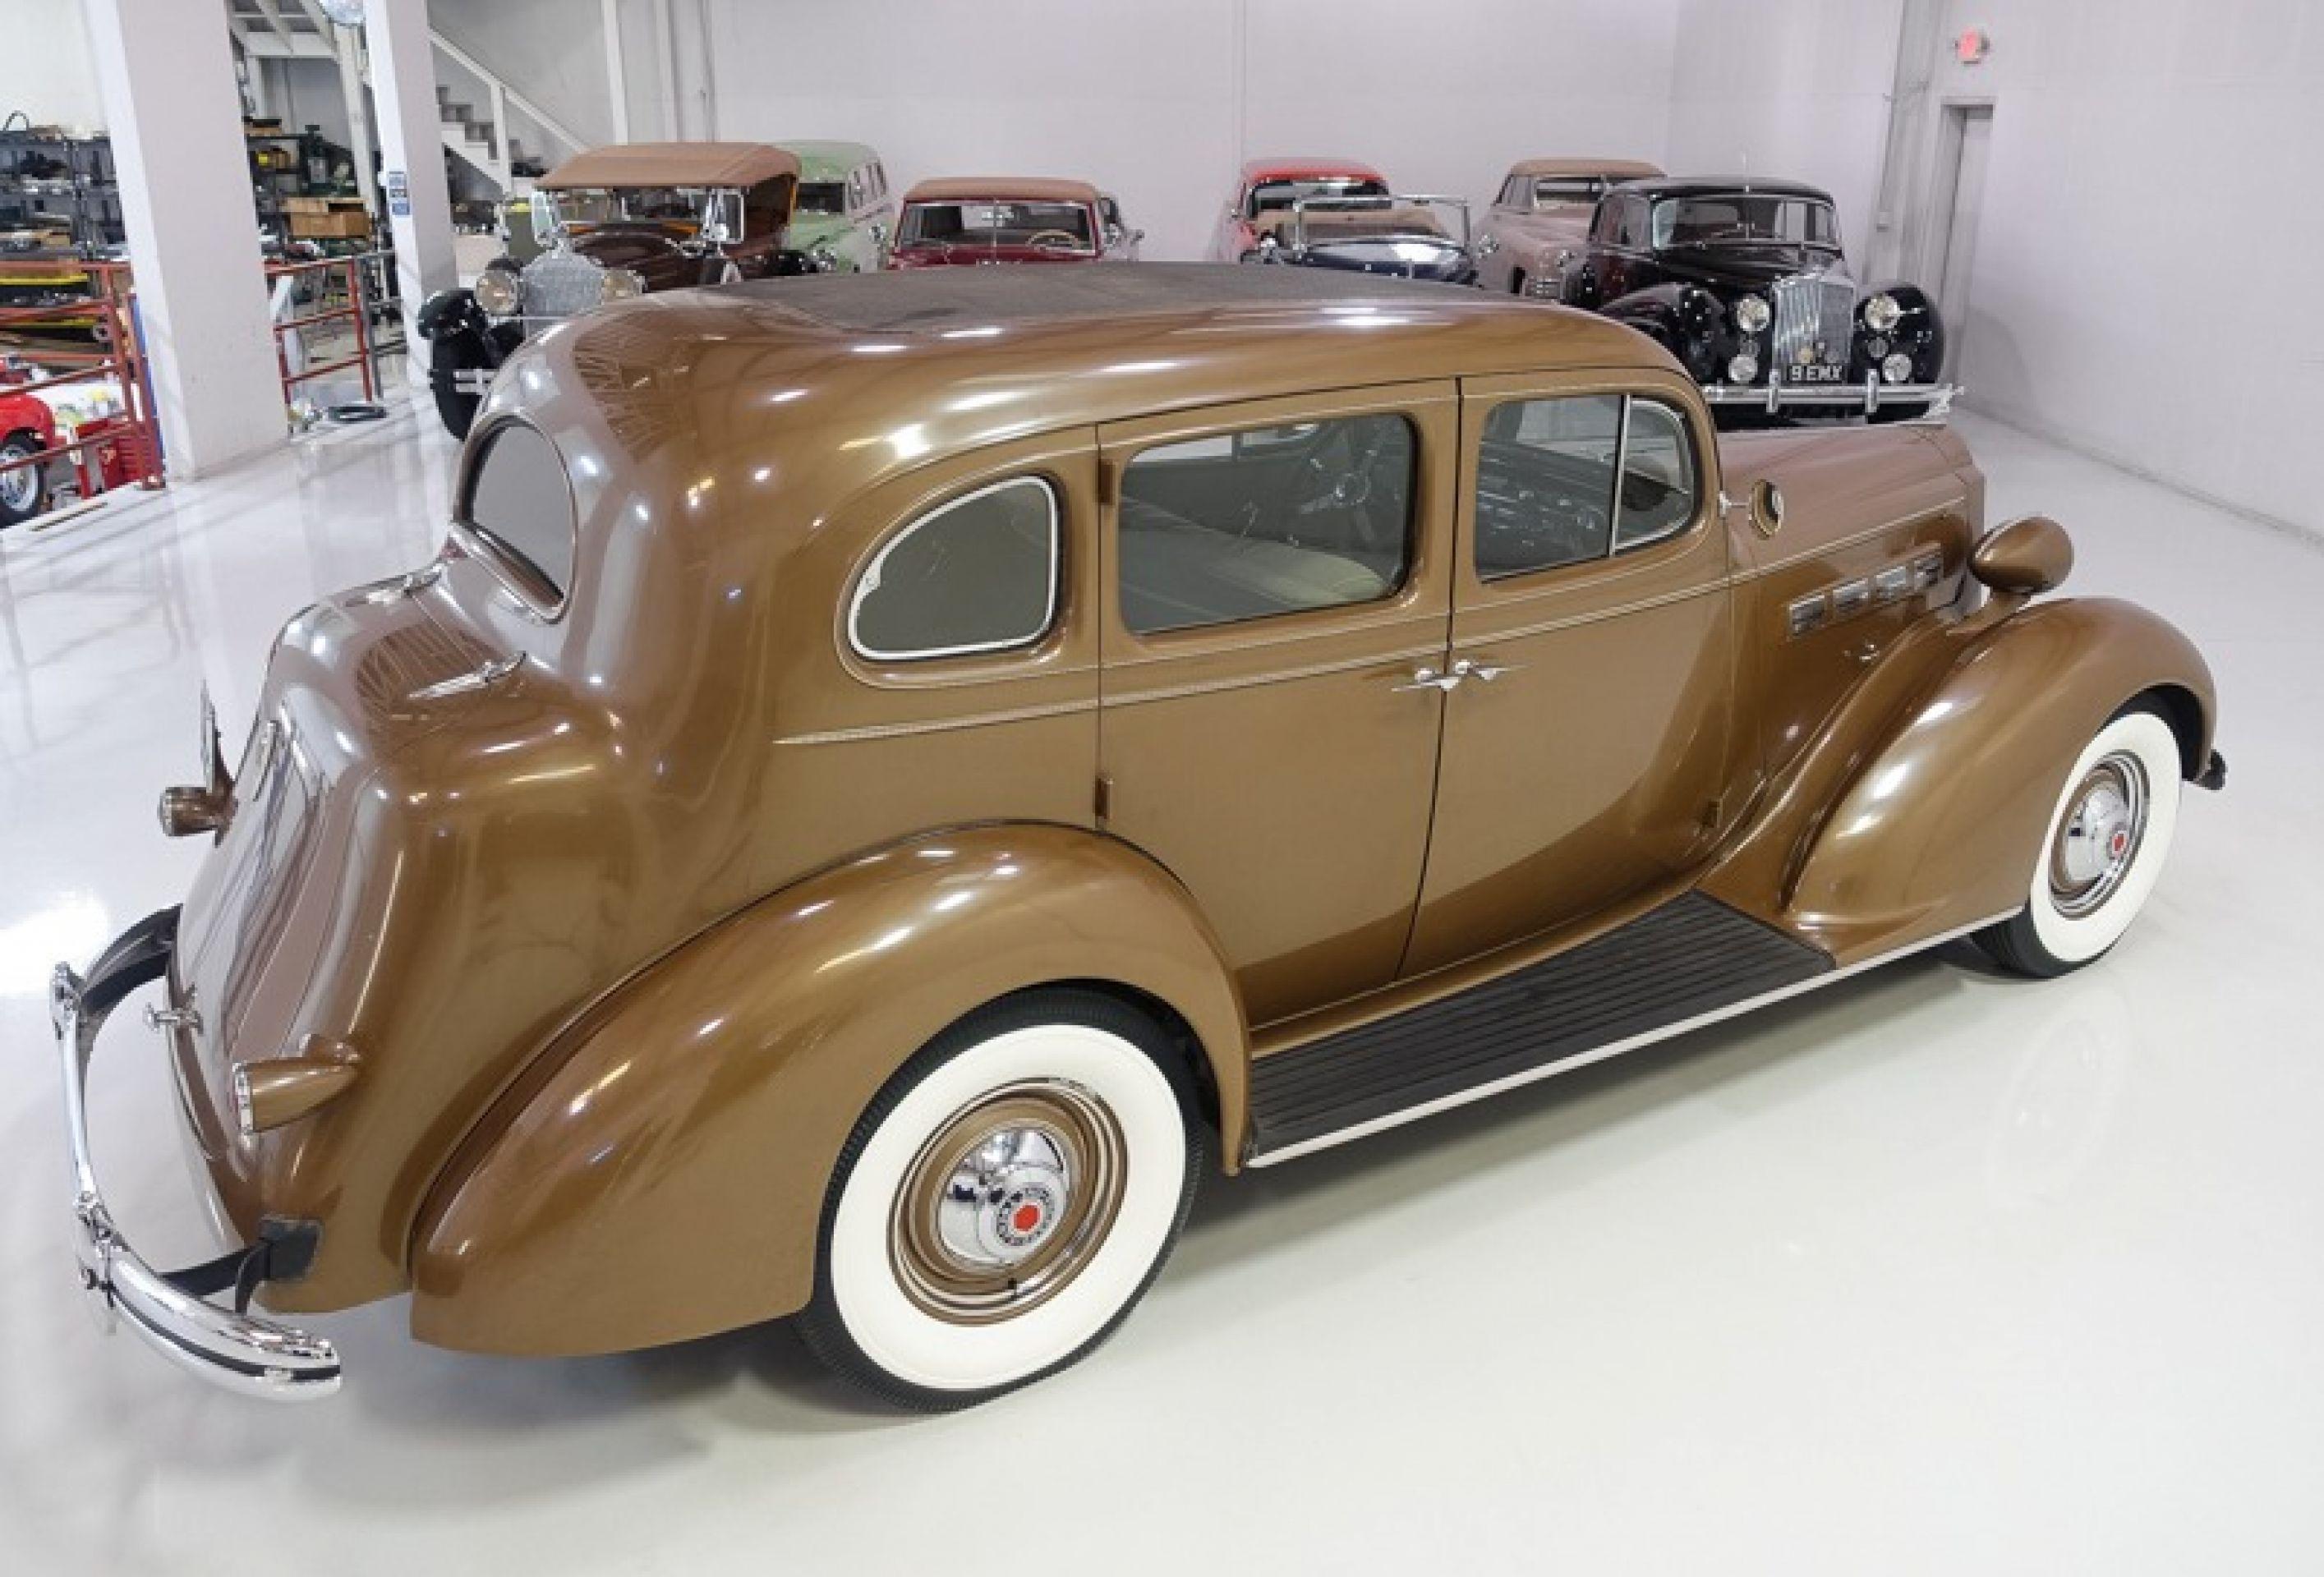 1937 Packard 120 Touring Sedan